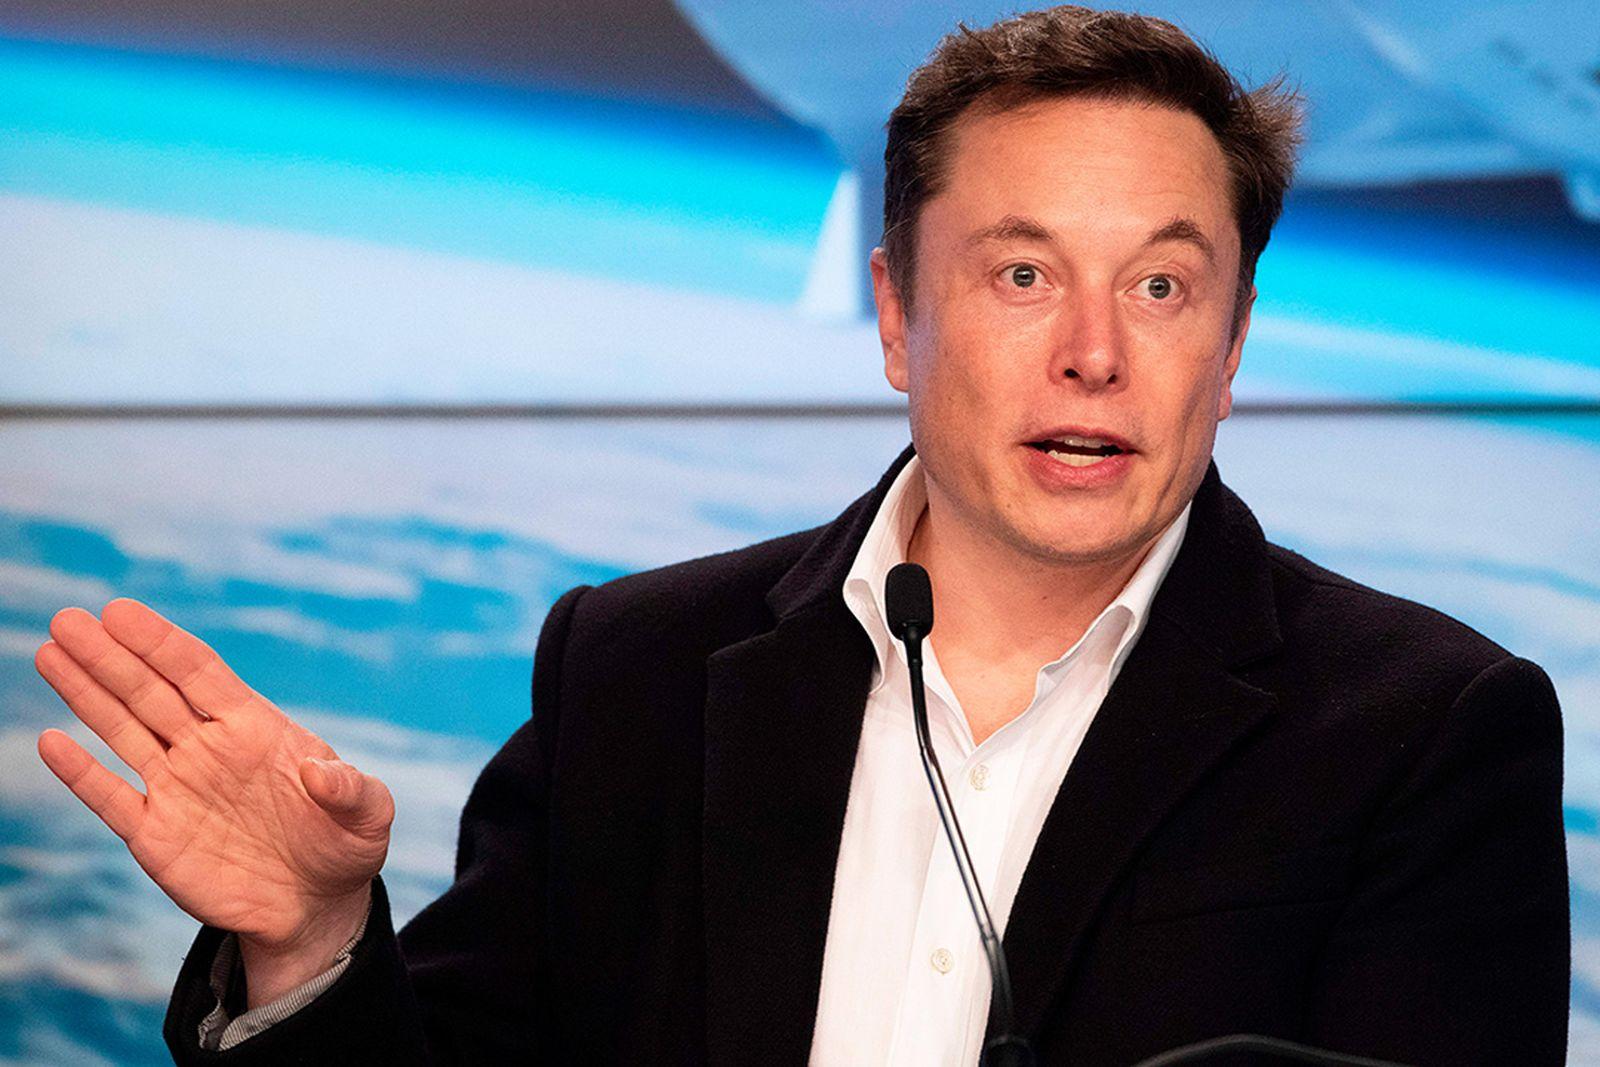 spacex starhopper starship rocket first test flight Elon Musk